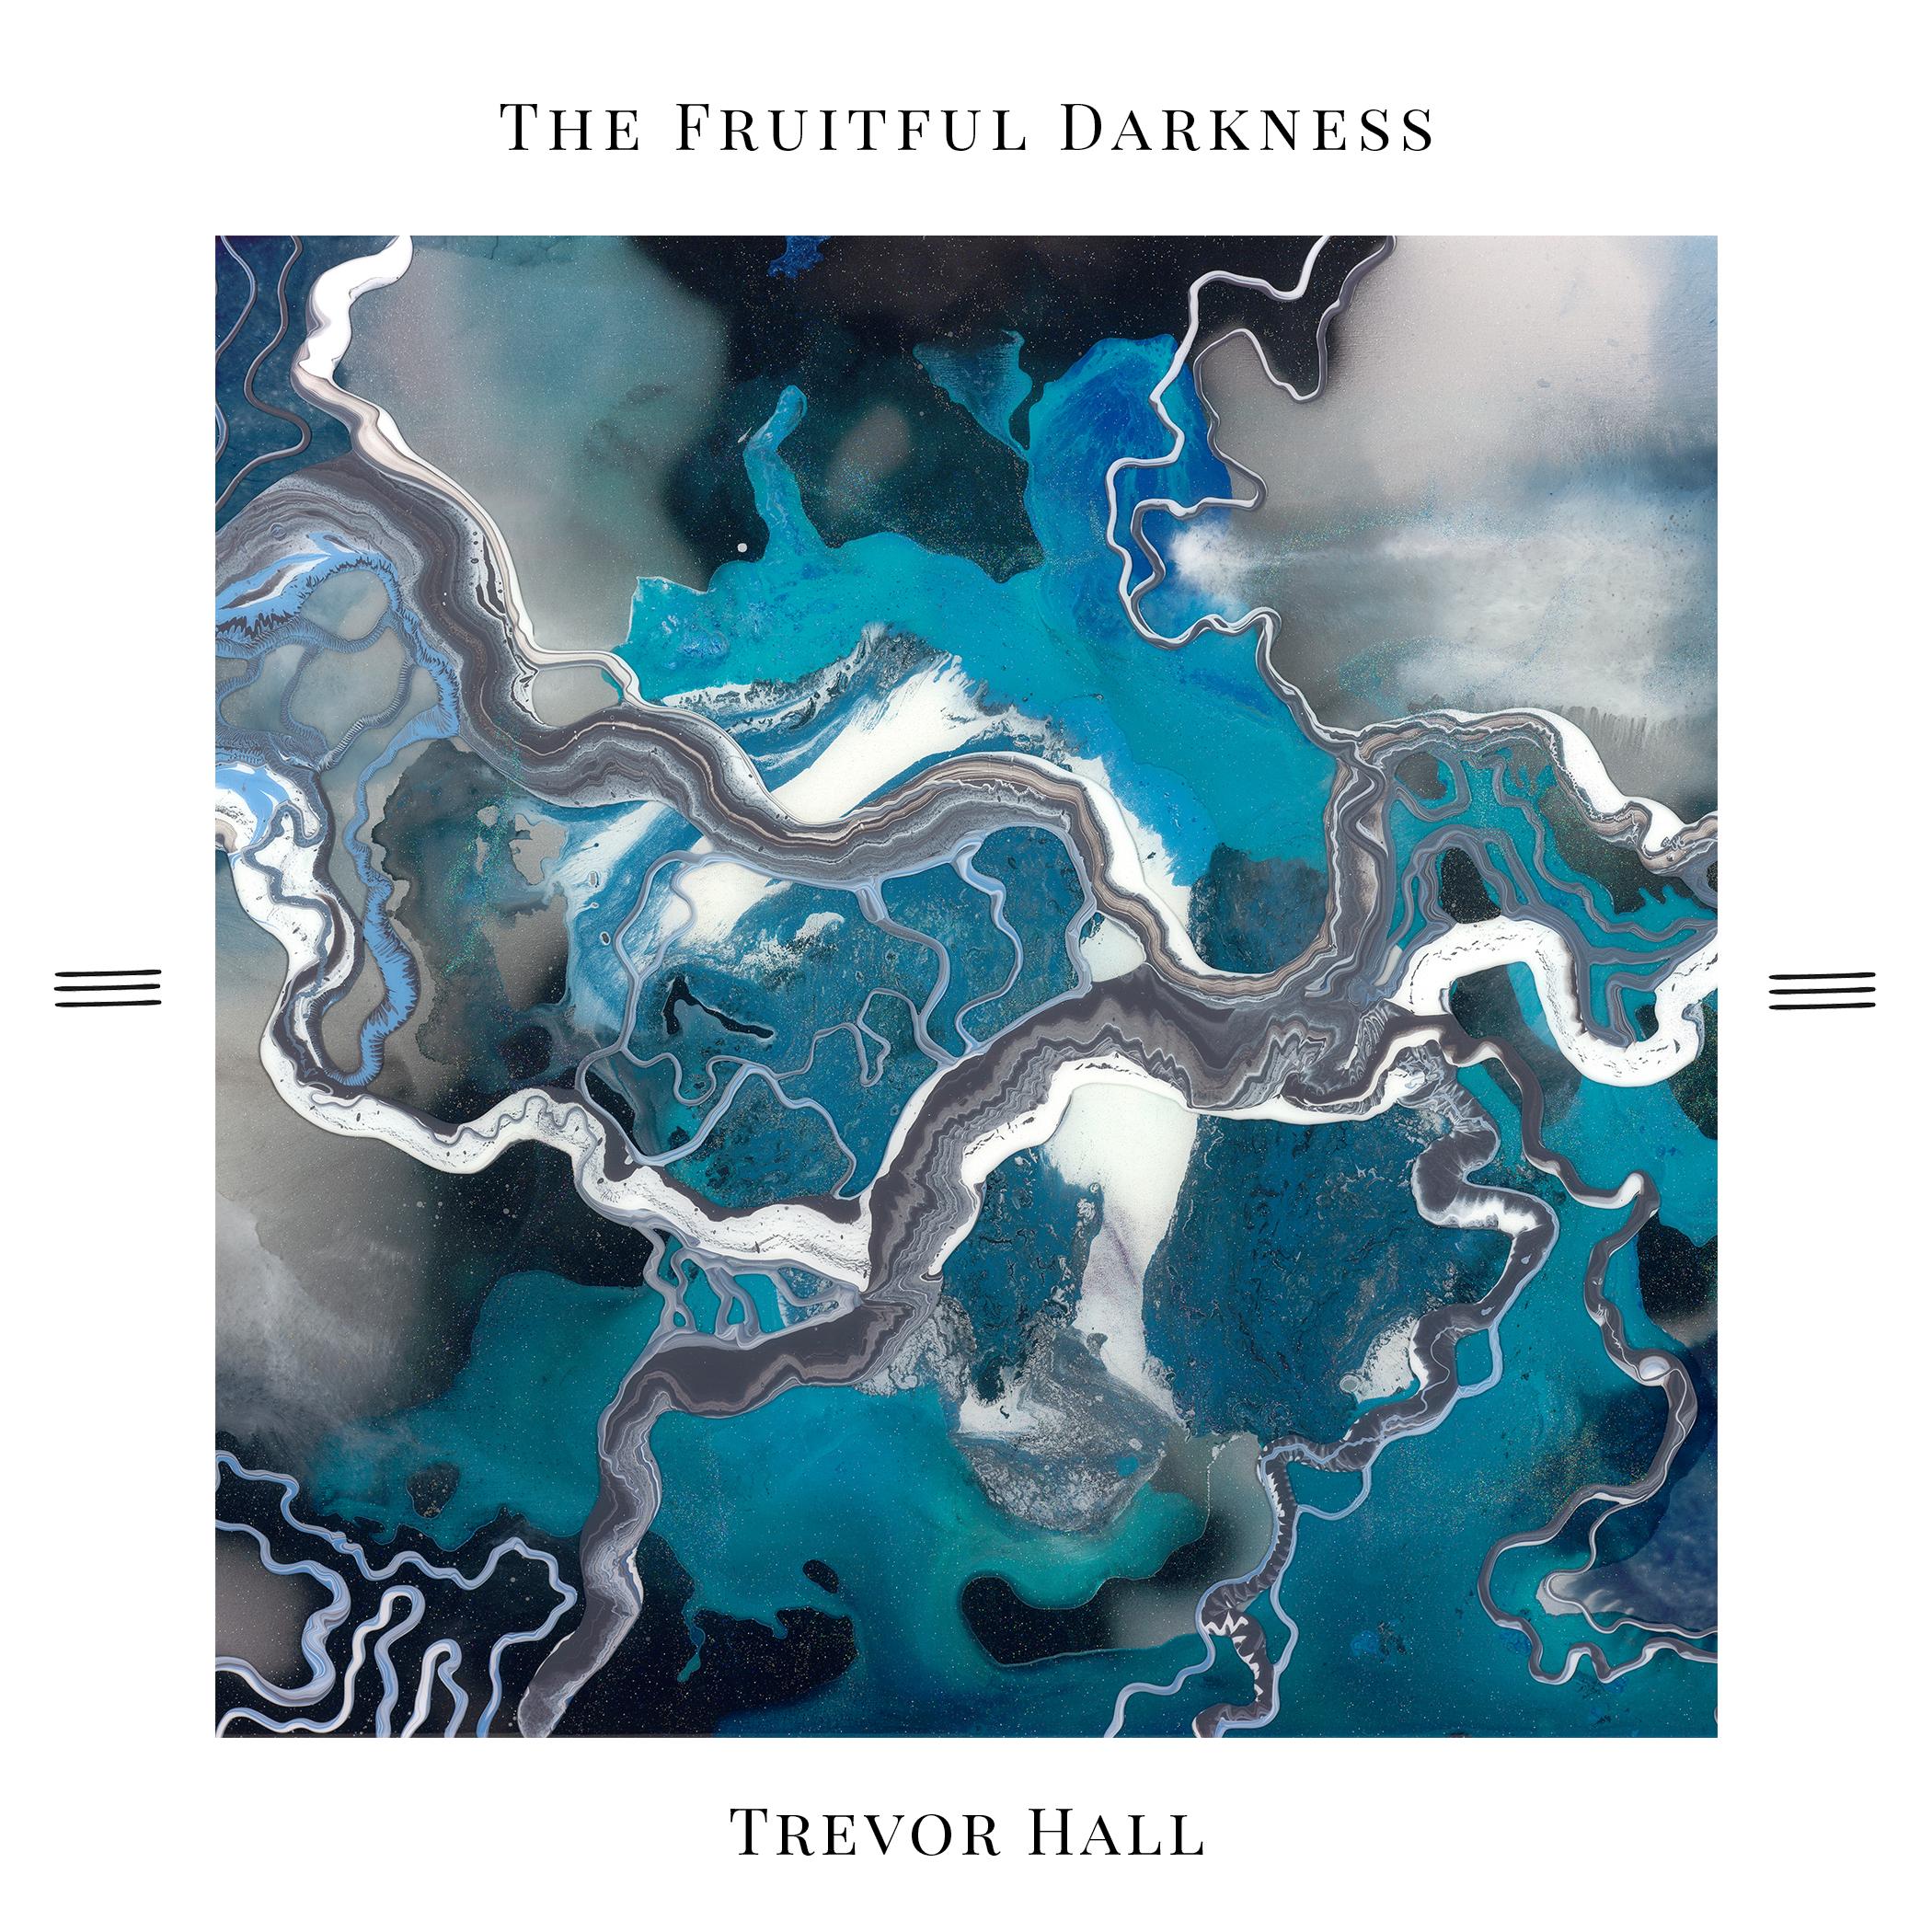 TrevorHall_TheFruitfulDarkness_AlbumCover_7x7.jpg